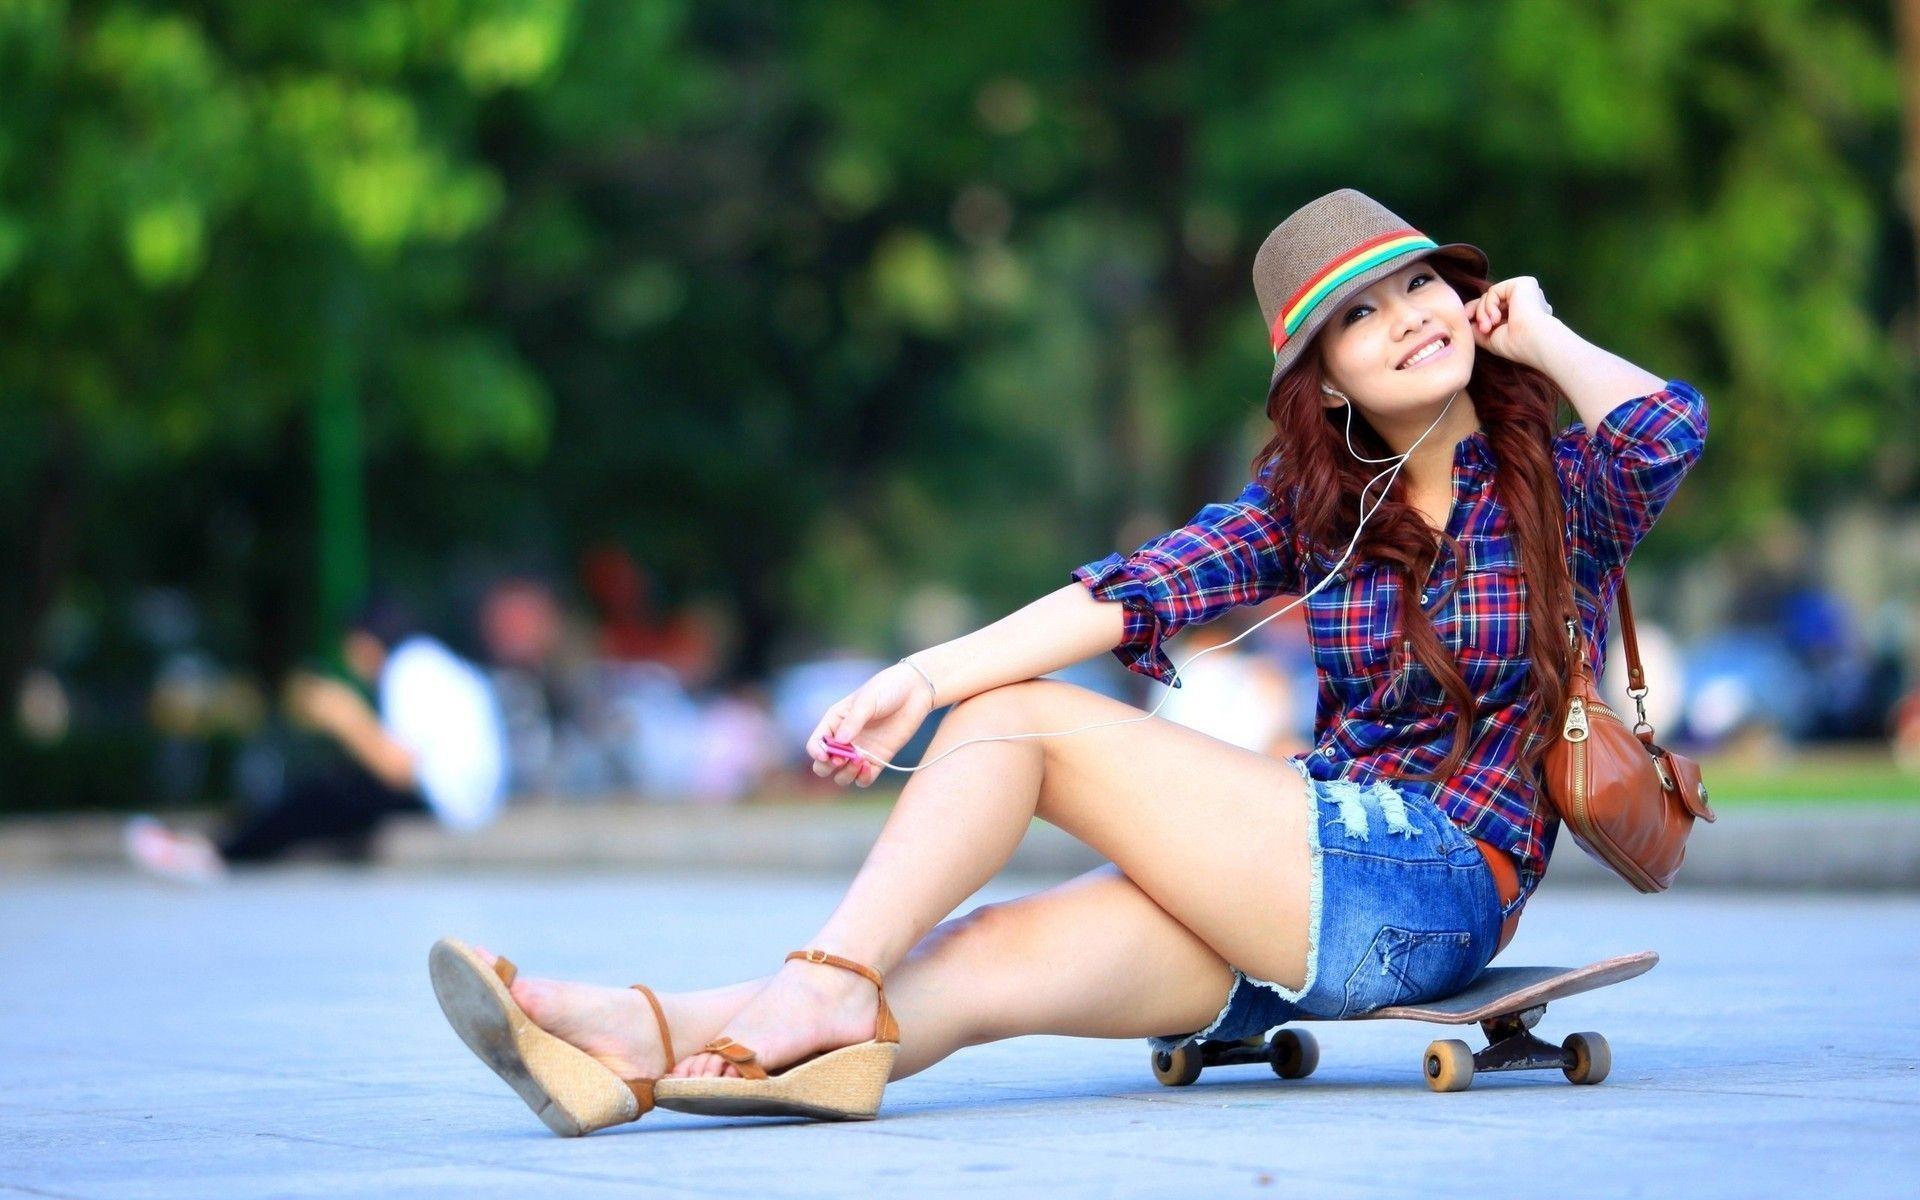 Skater Girl HD Desktop Wallpapers ~ Toptenpack.com